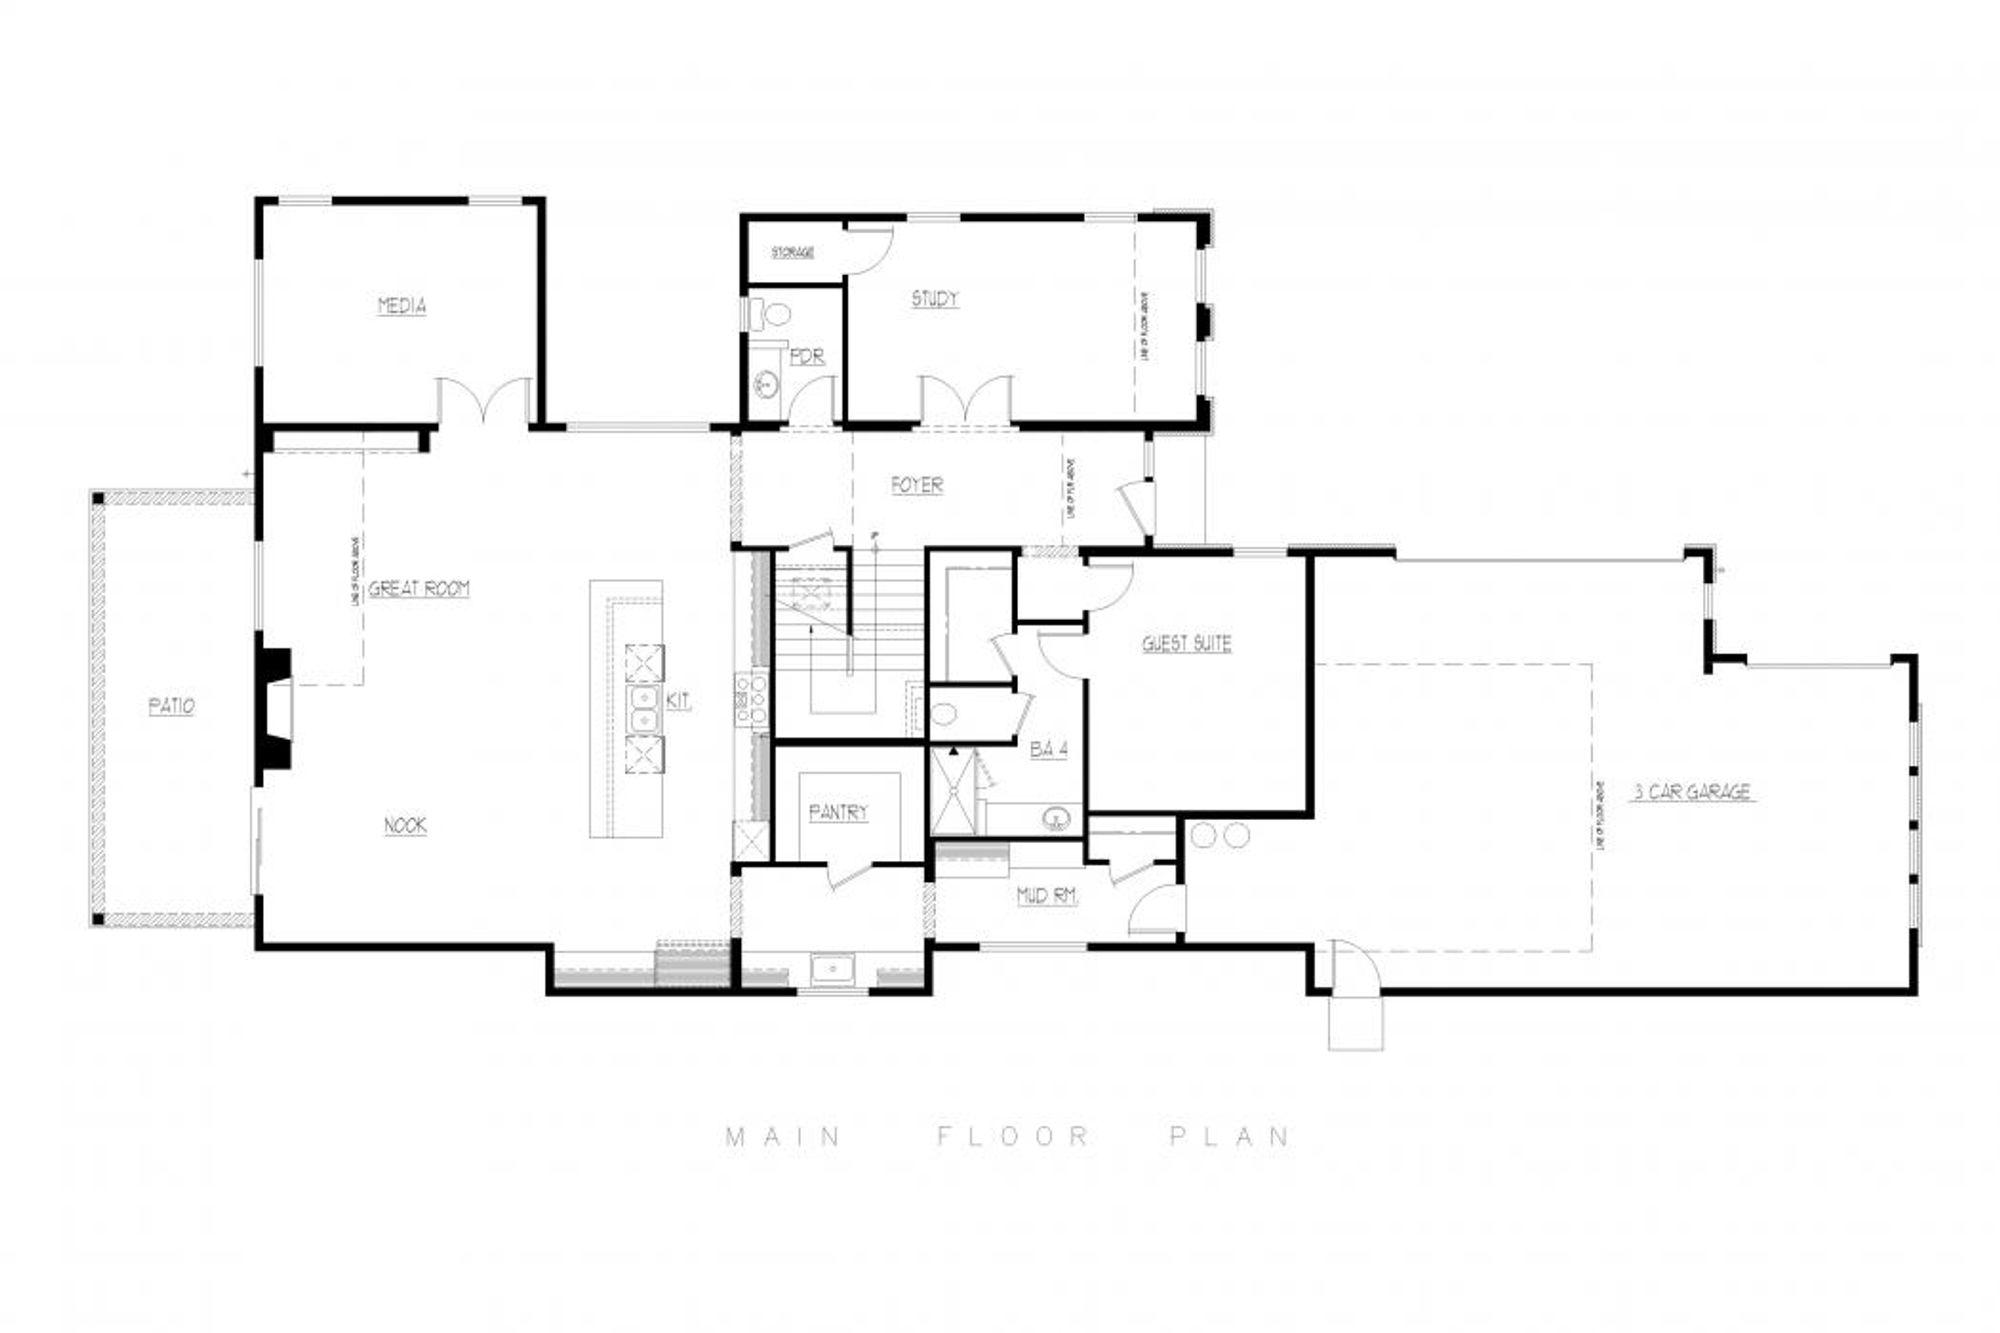 Tuscany Main Floor Plan